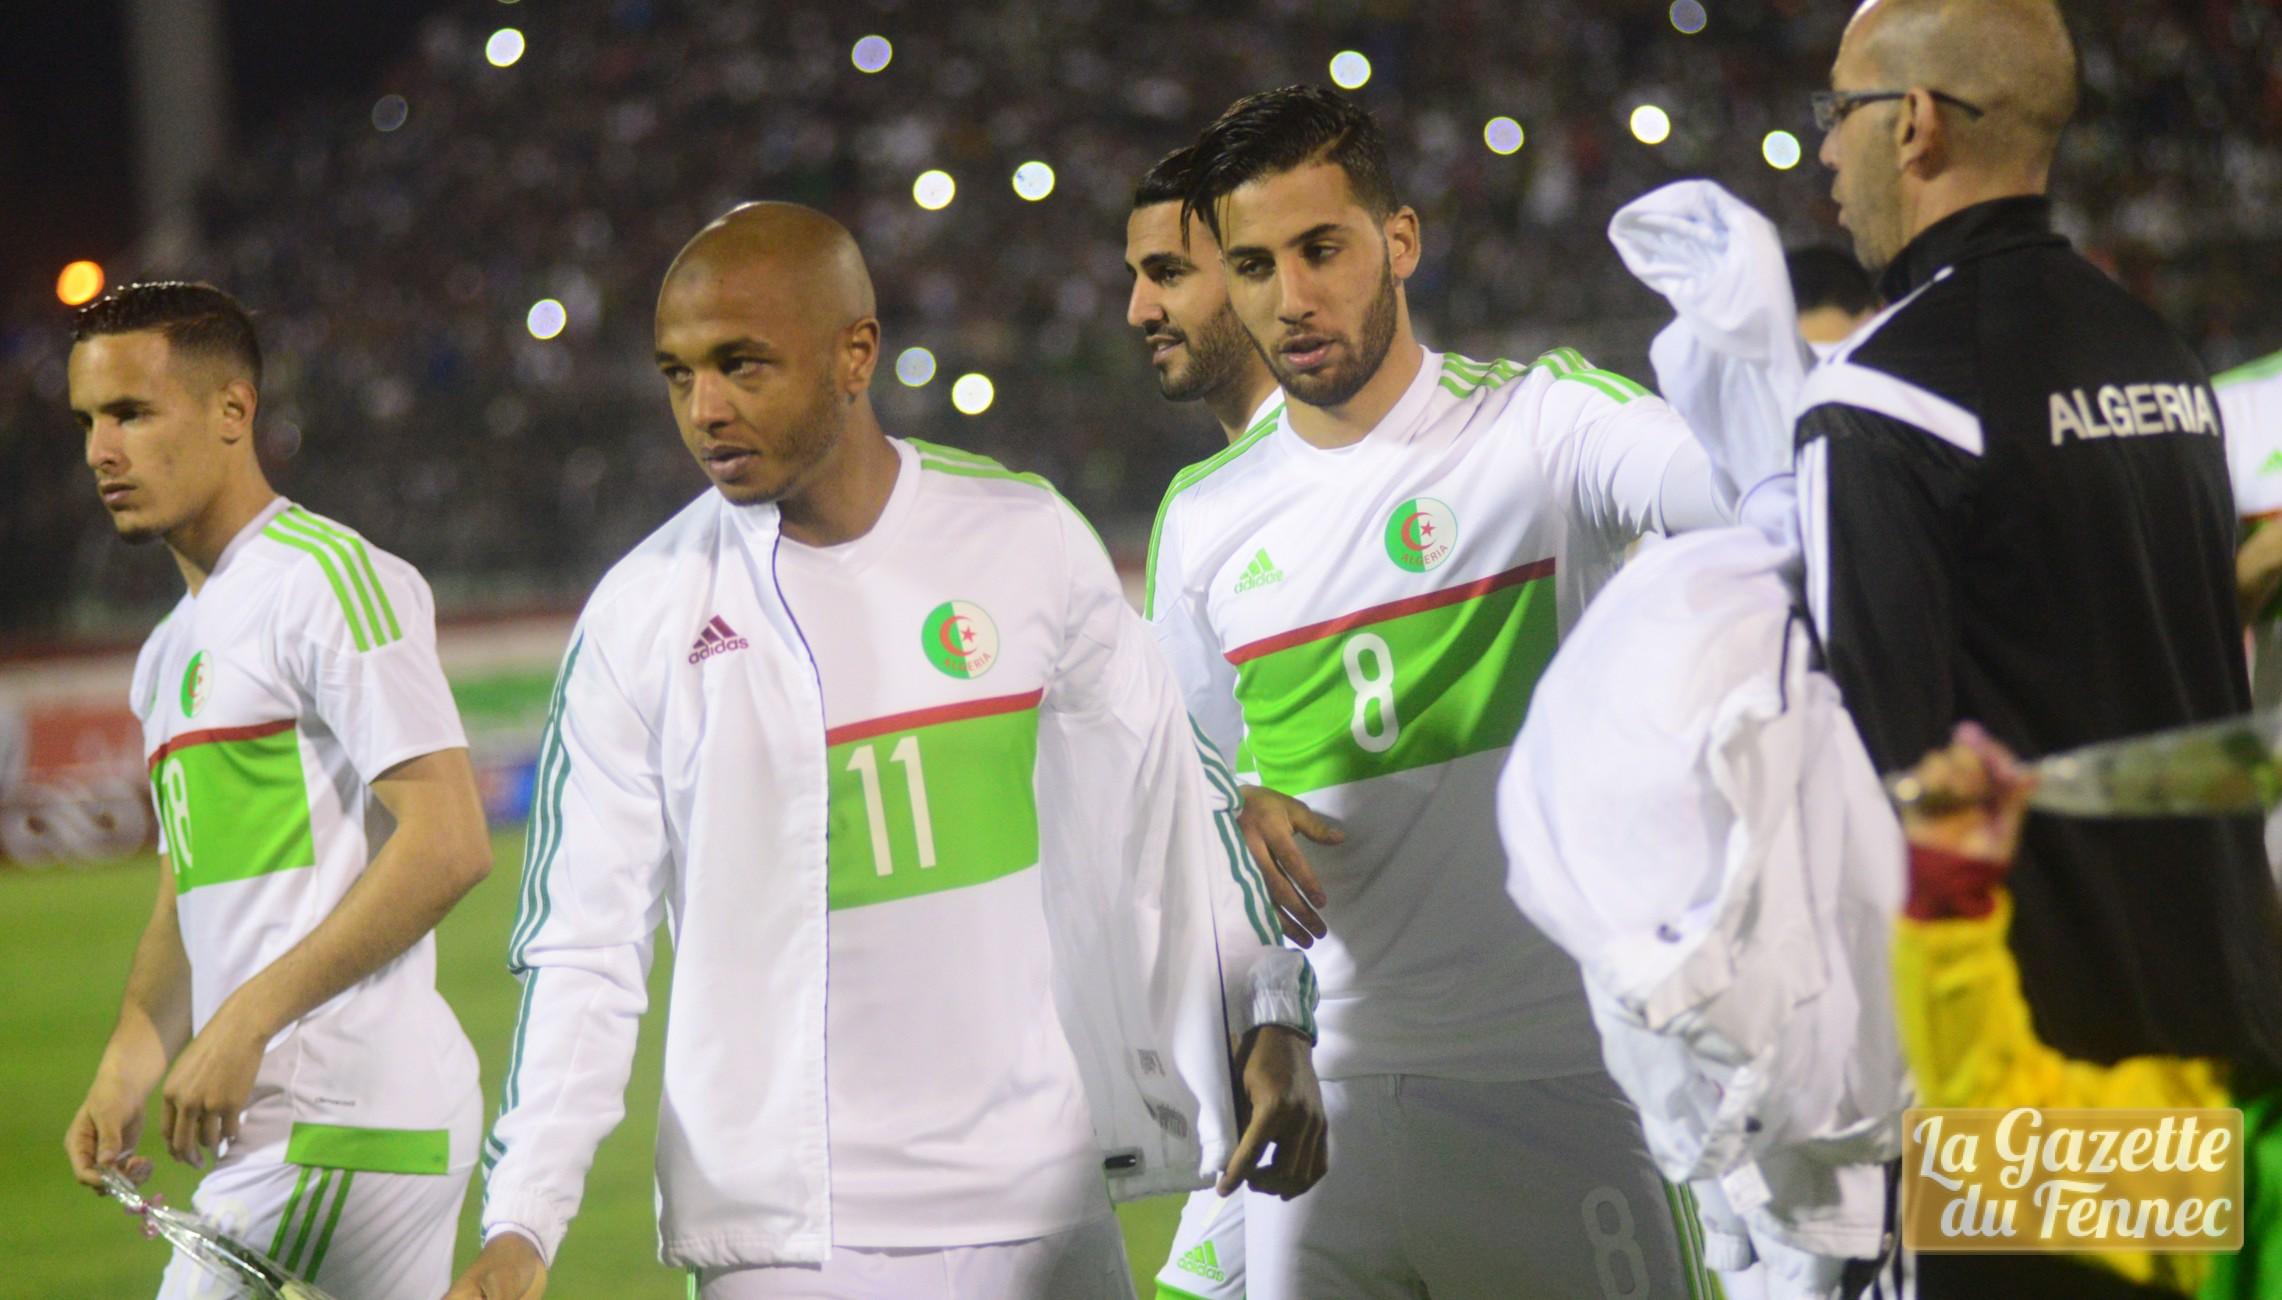 Yacine Brahimi L Algérie a aujourd hui une équipe tr¨s soudée